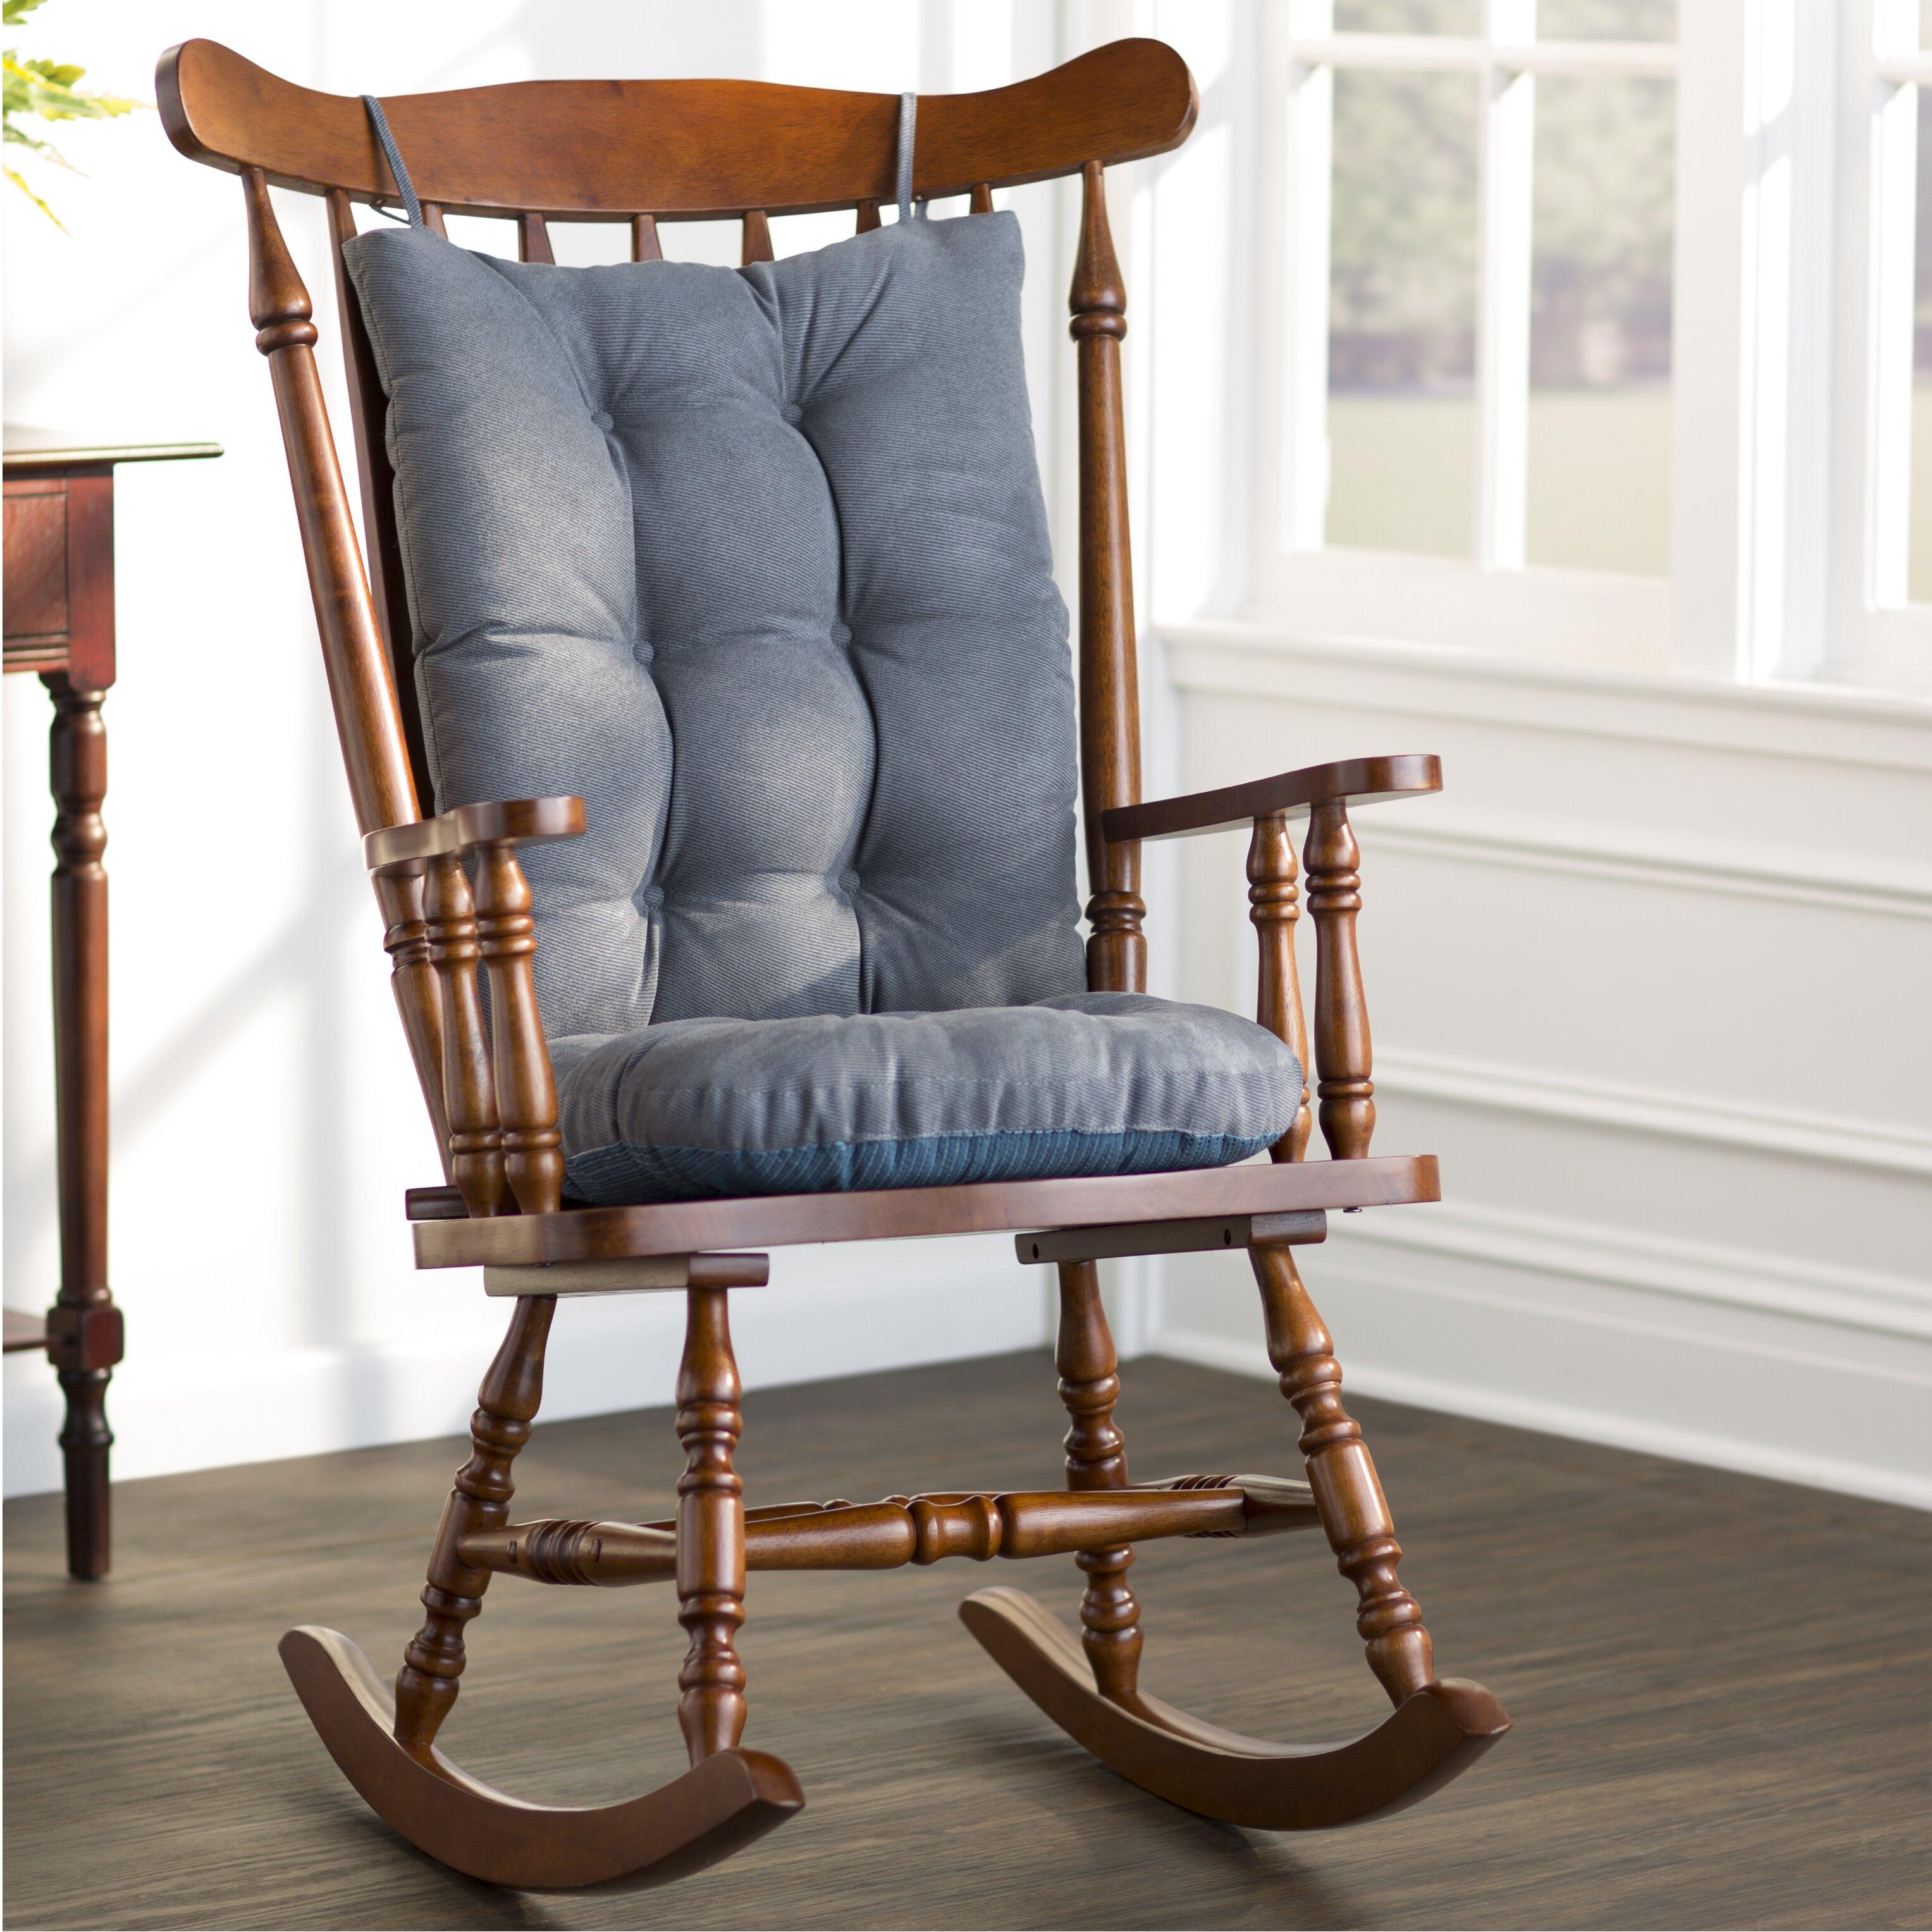 Chair cushions for